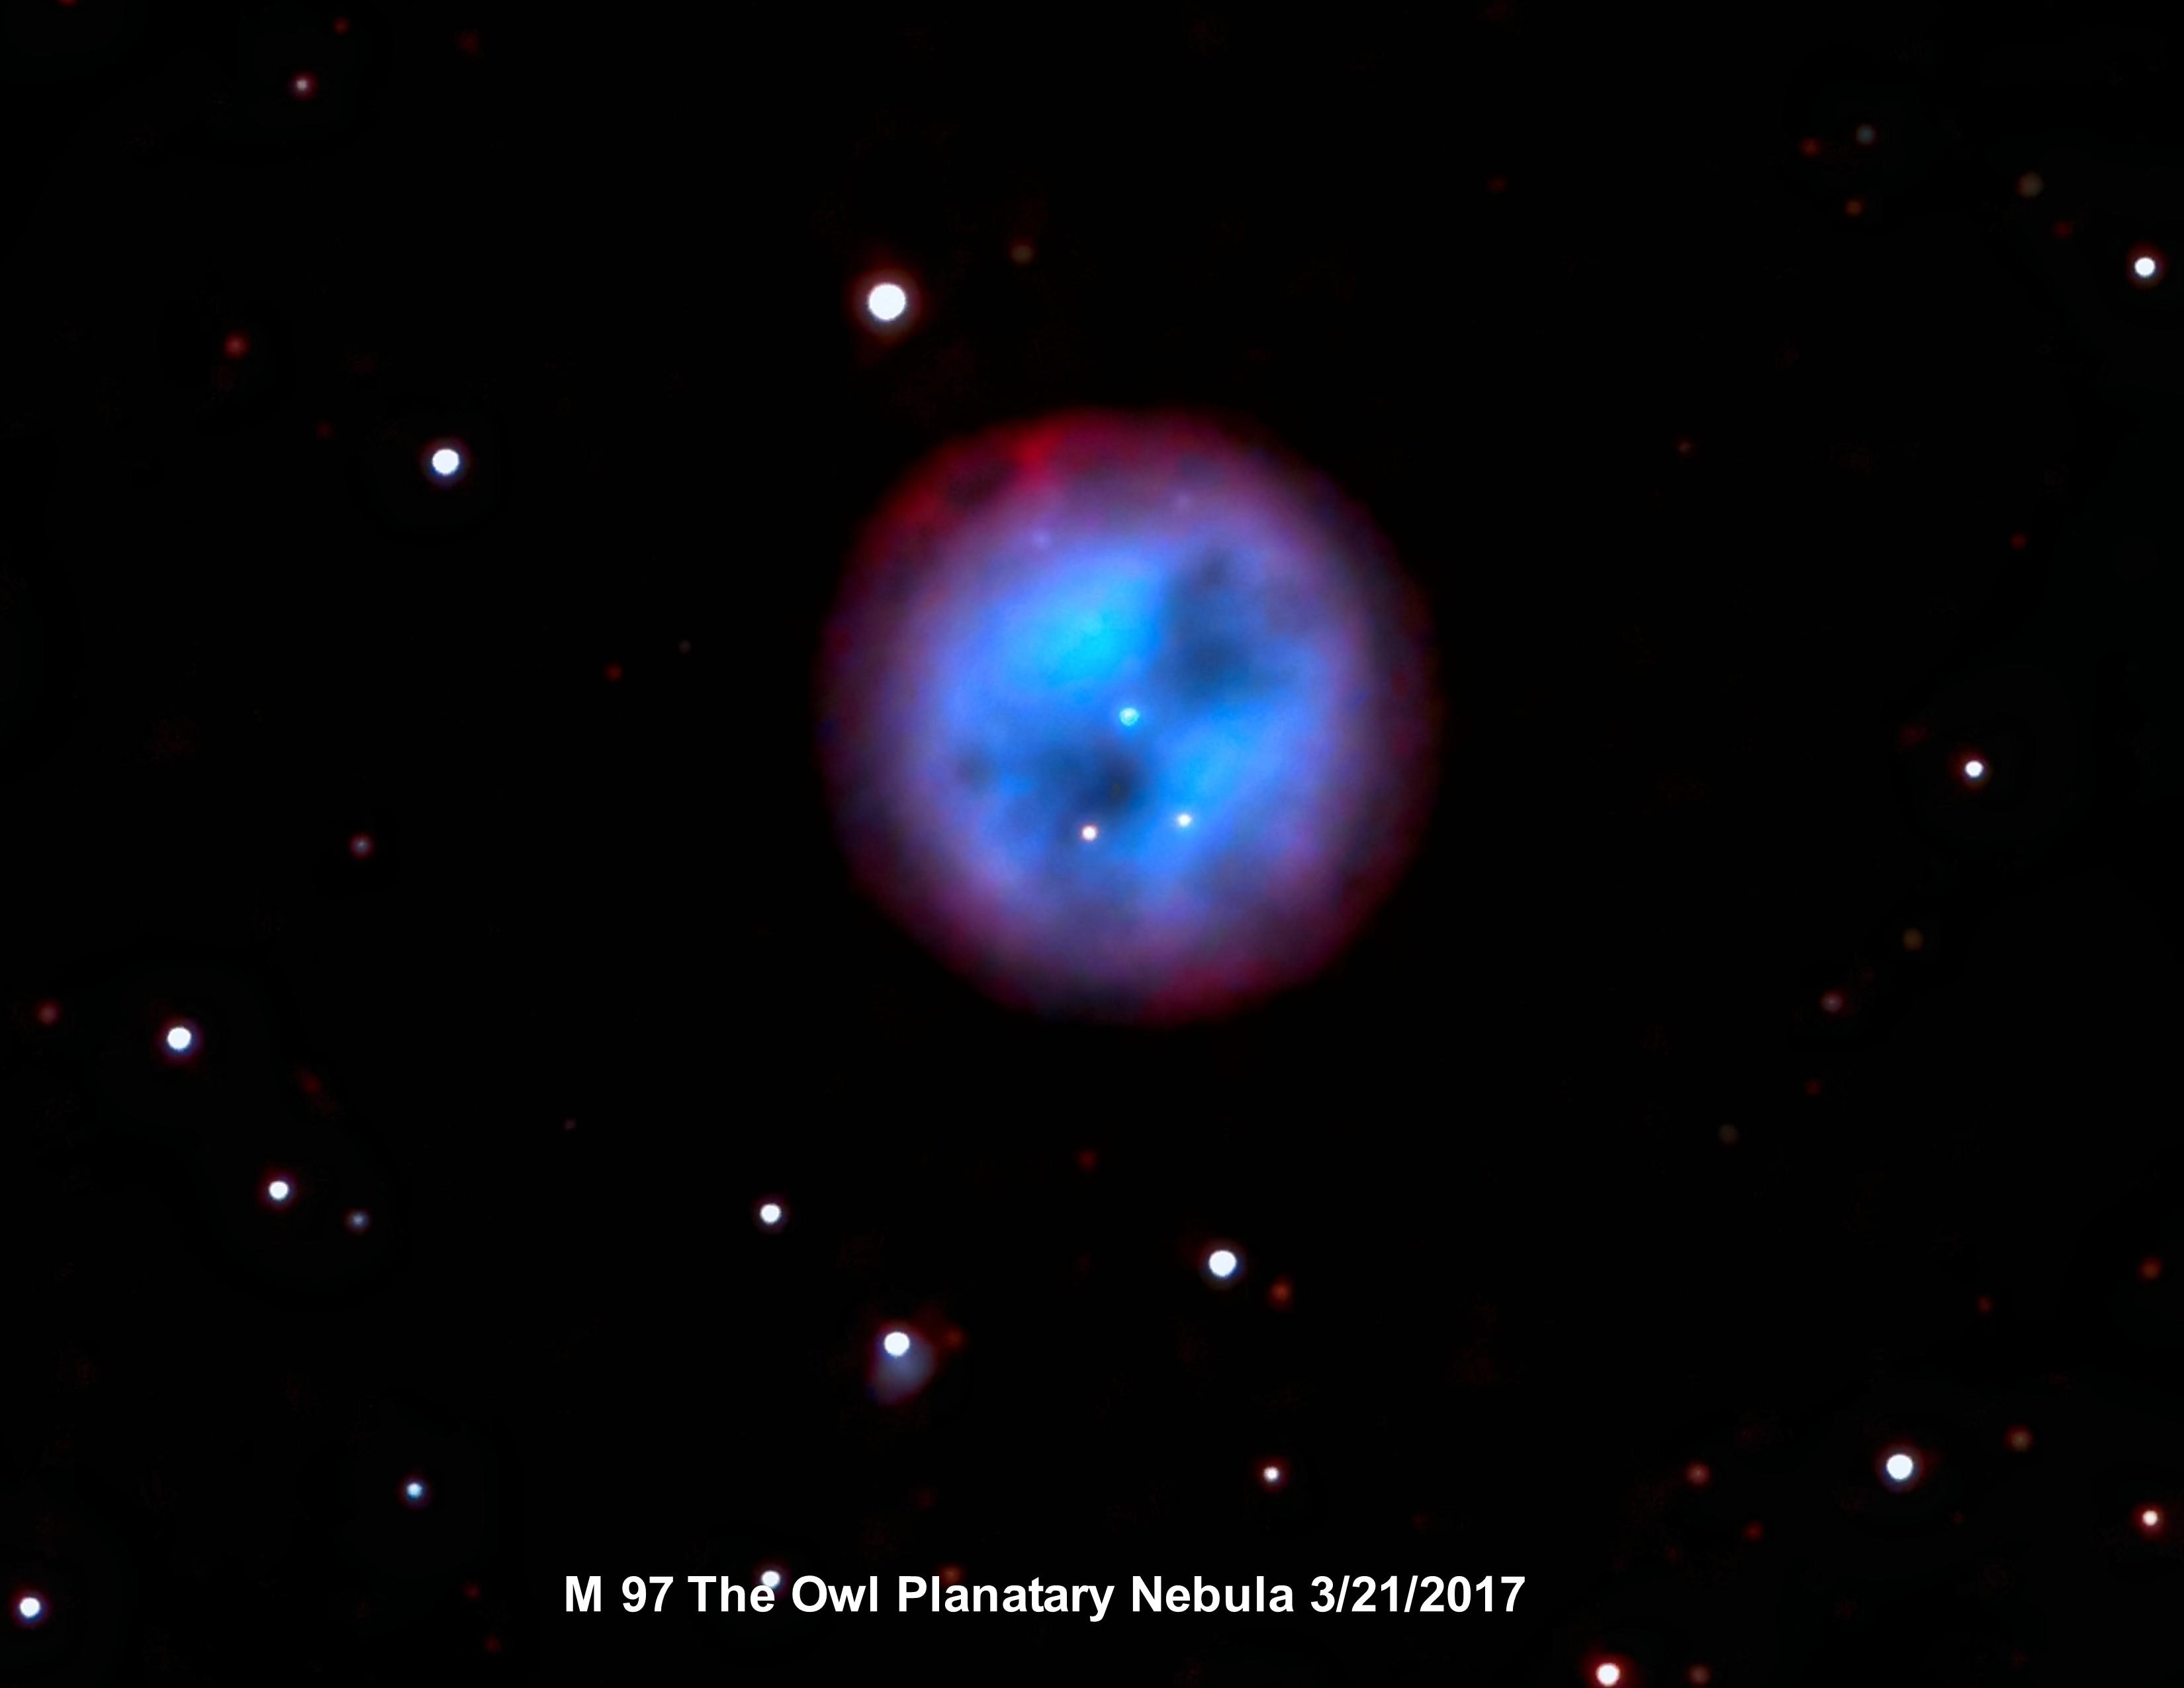 M 97 Owl Planitary Nebula